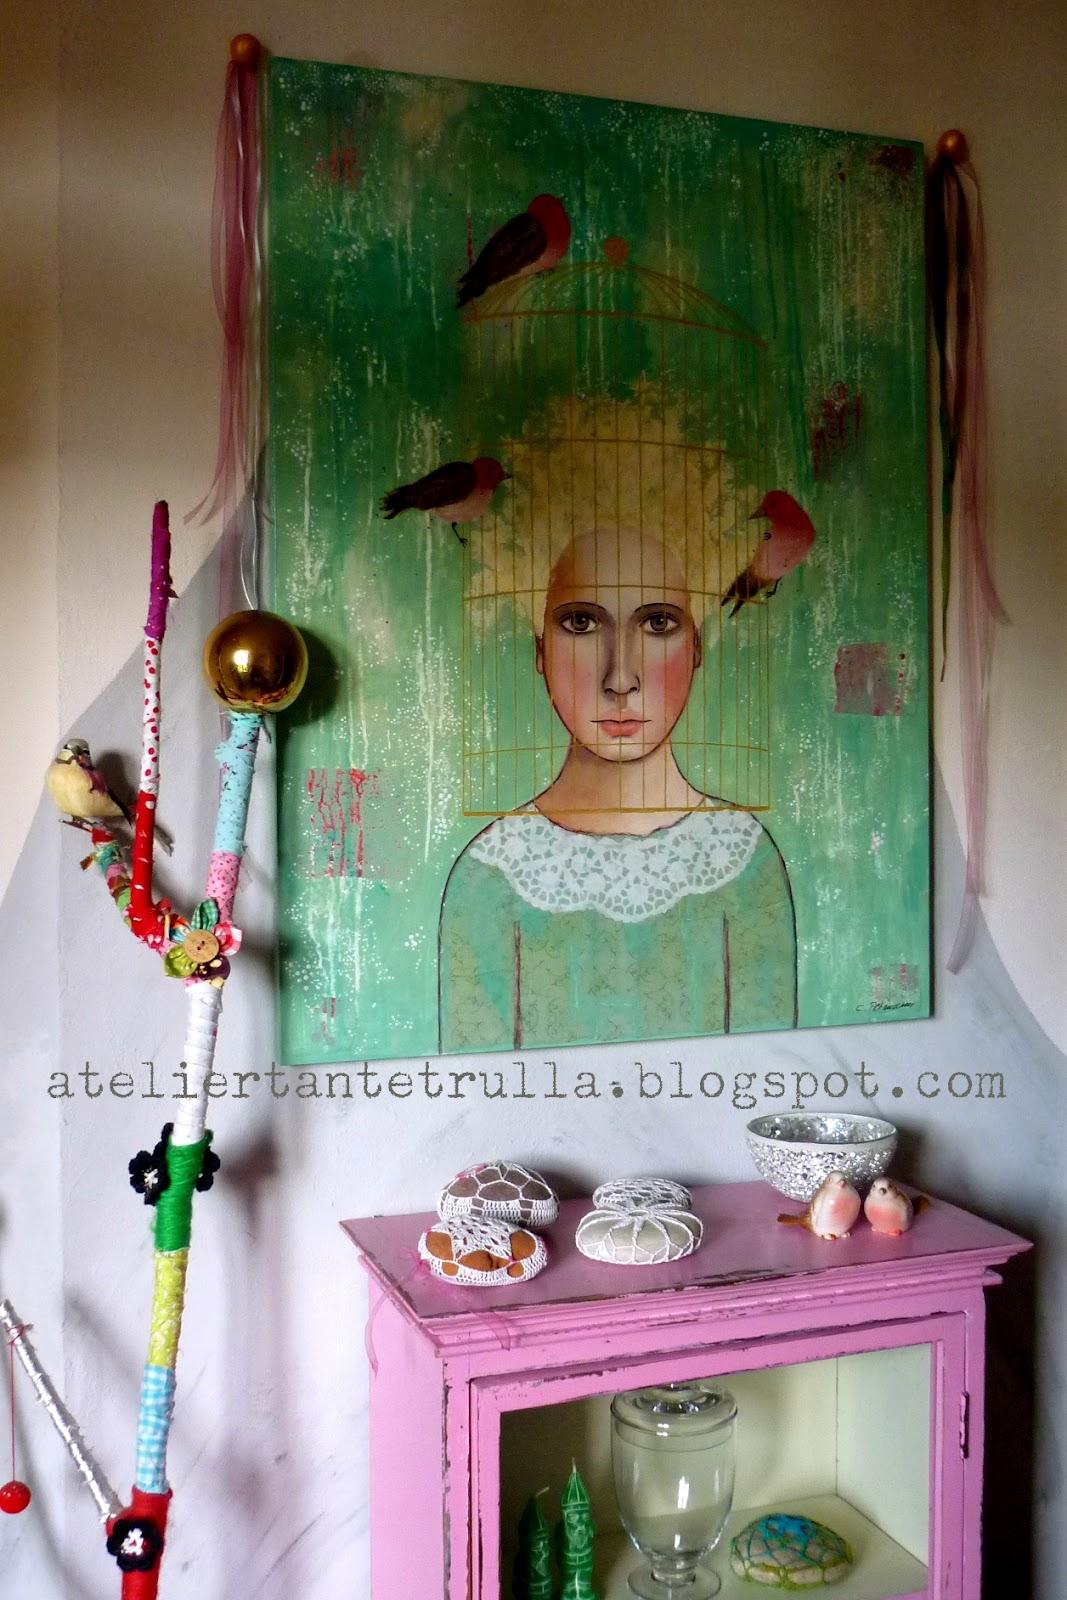 atelier tante trulla verkauft original gem lde. Black Bedroom Furniture Sets. Home Design Ideas